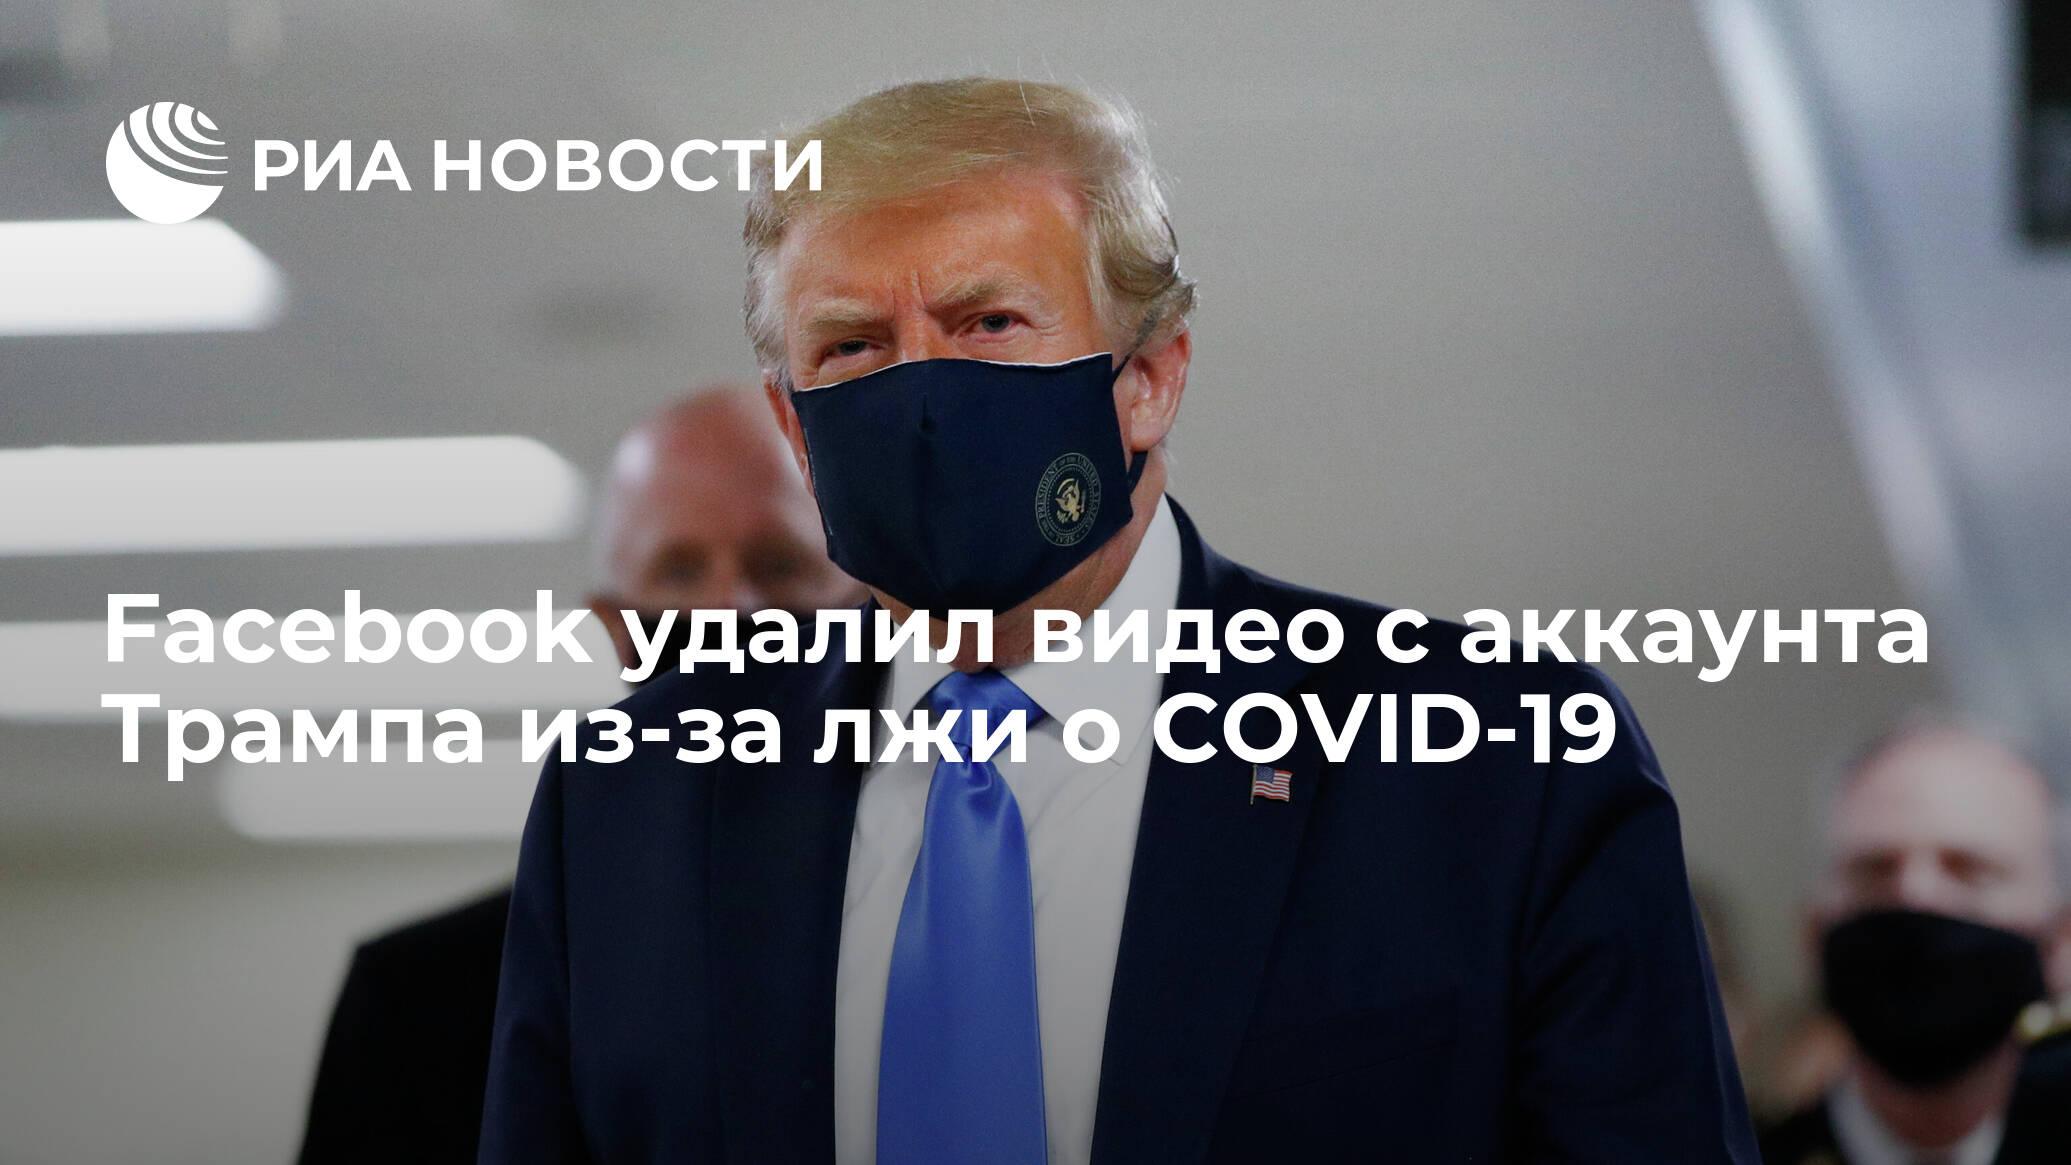 Facebook удалил видео с аккаунта Трампа из-за лжи о COVID-19